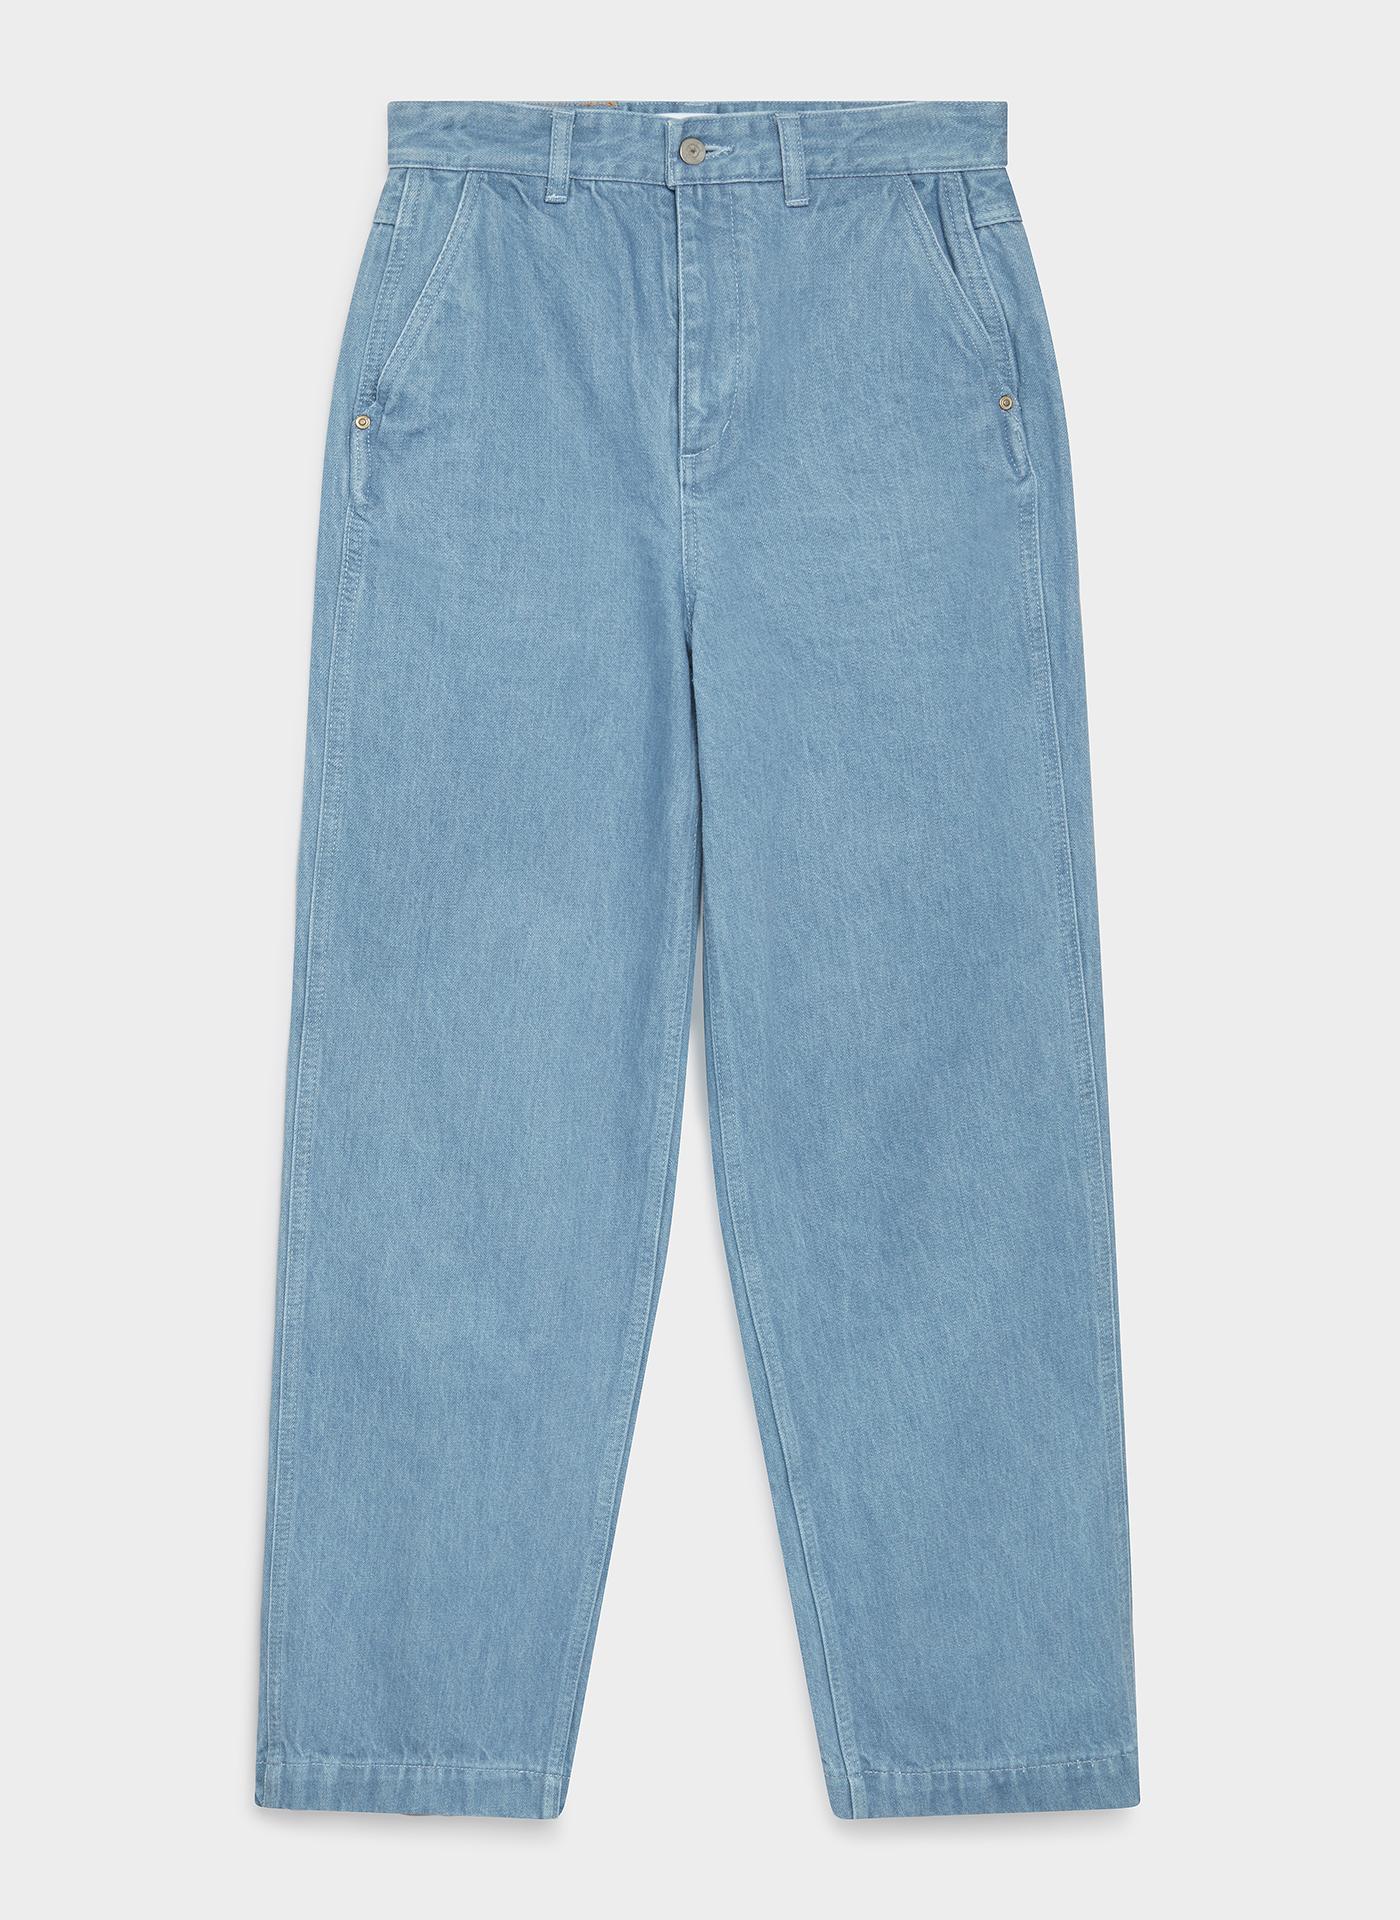 J&M light blue jeans / trousers